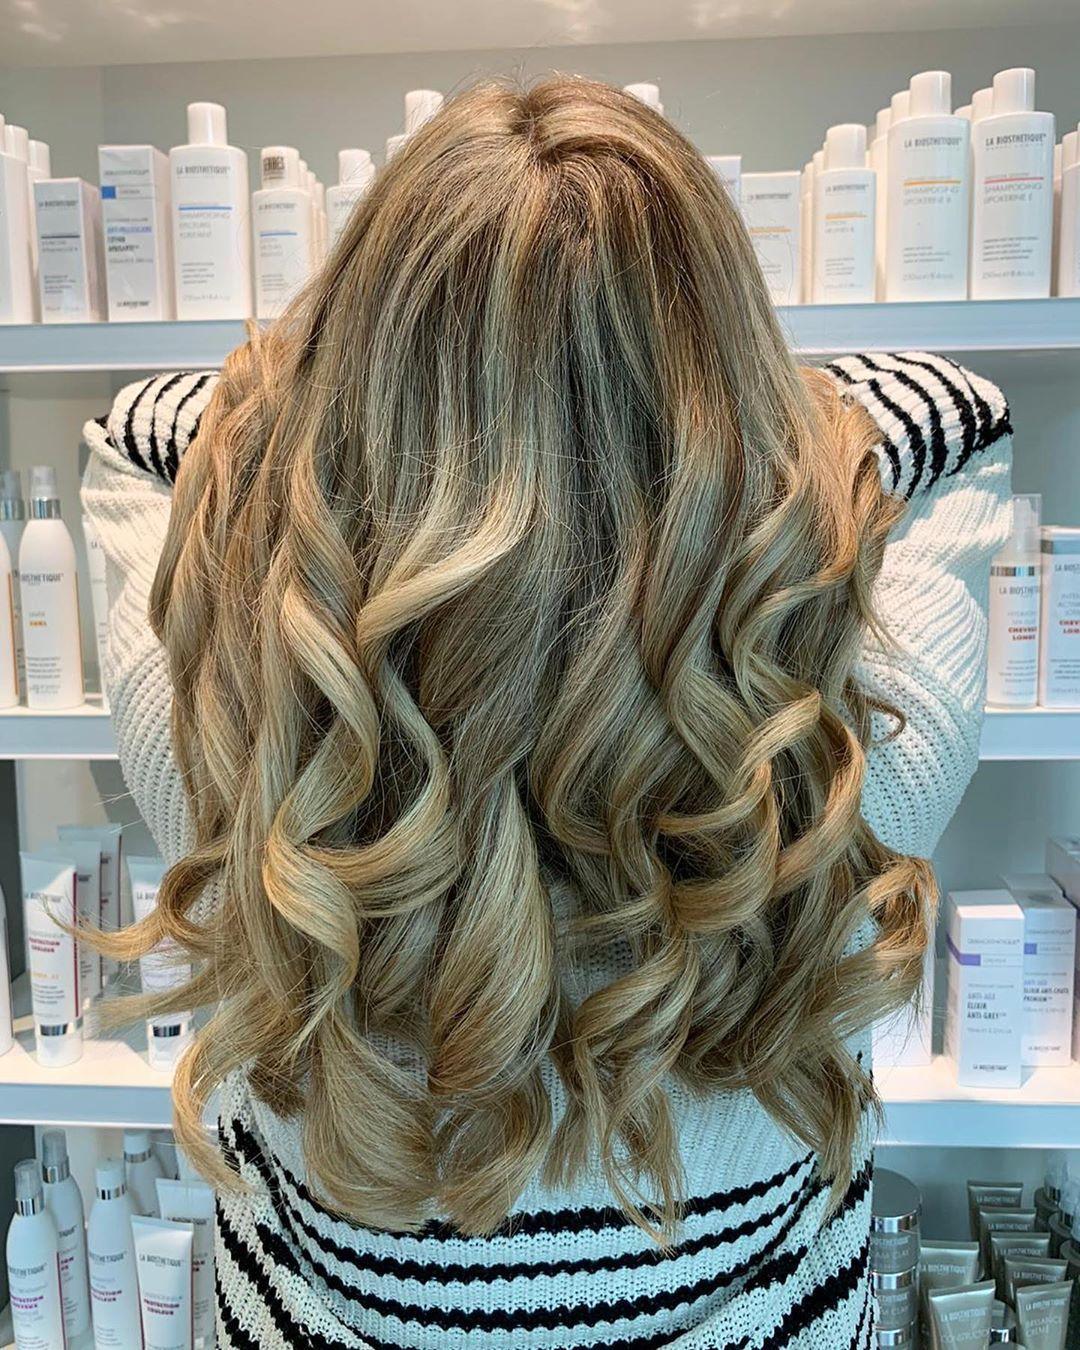 Tumblr In 2020 Hair Styles Long Hair Styles Hair